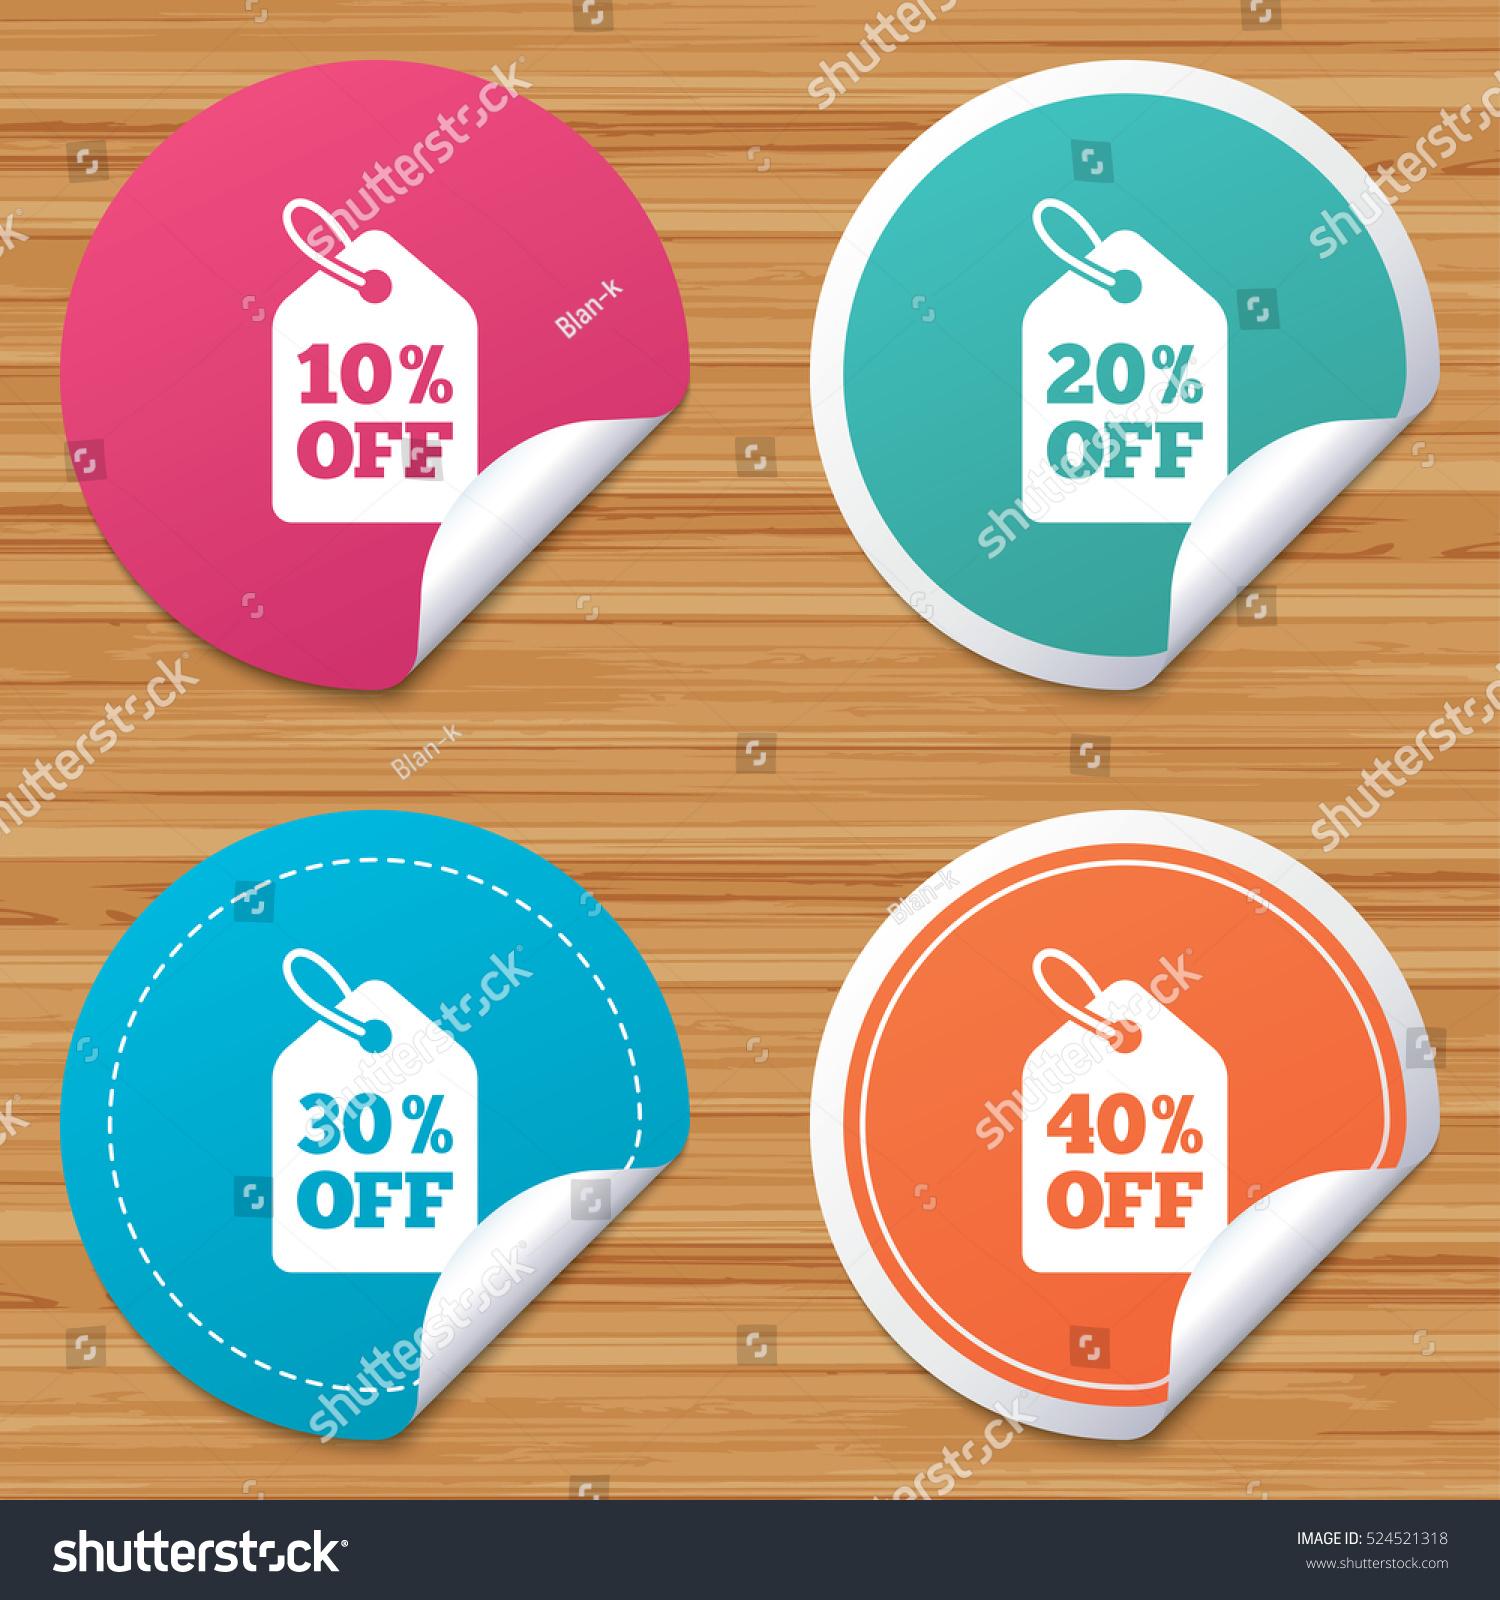 round stickers website banners sale price のベクター画像素材